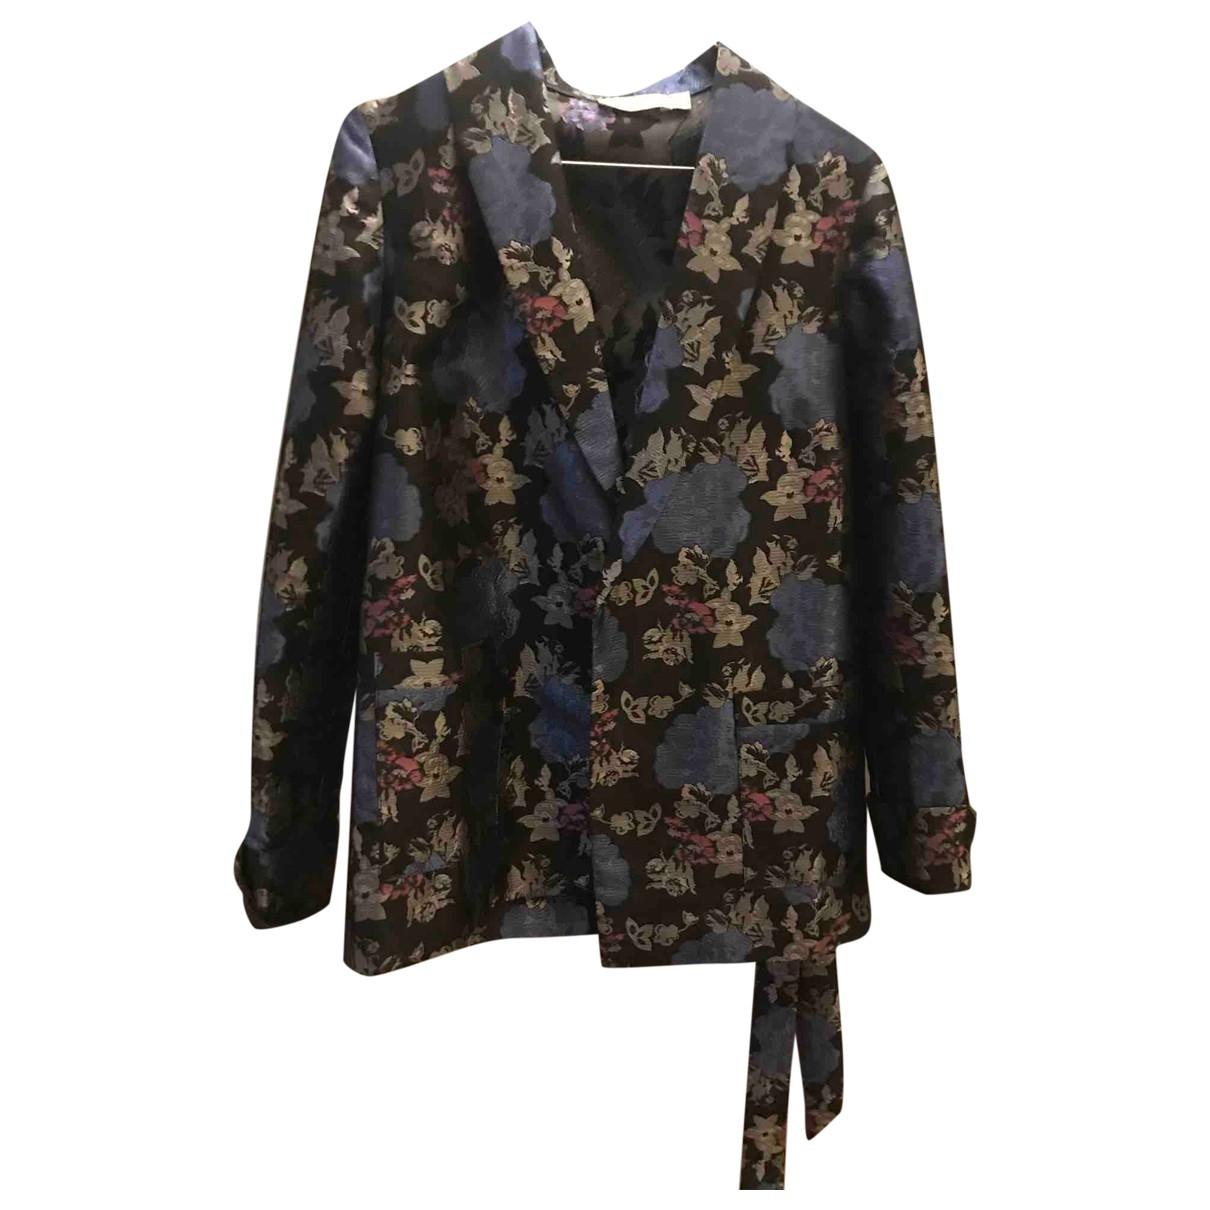 Asos \N Blue jacket for Women 34 FR